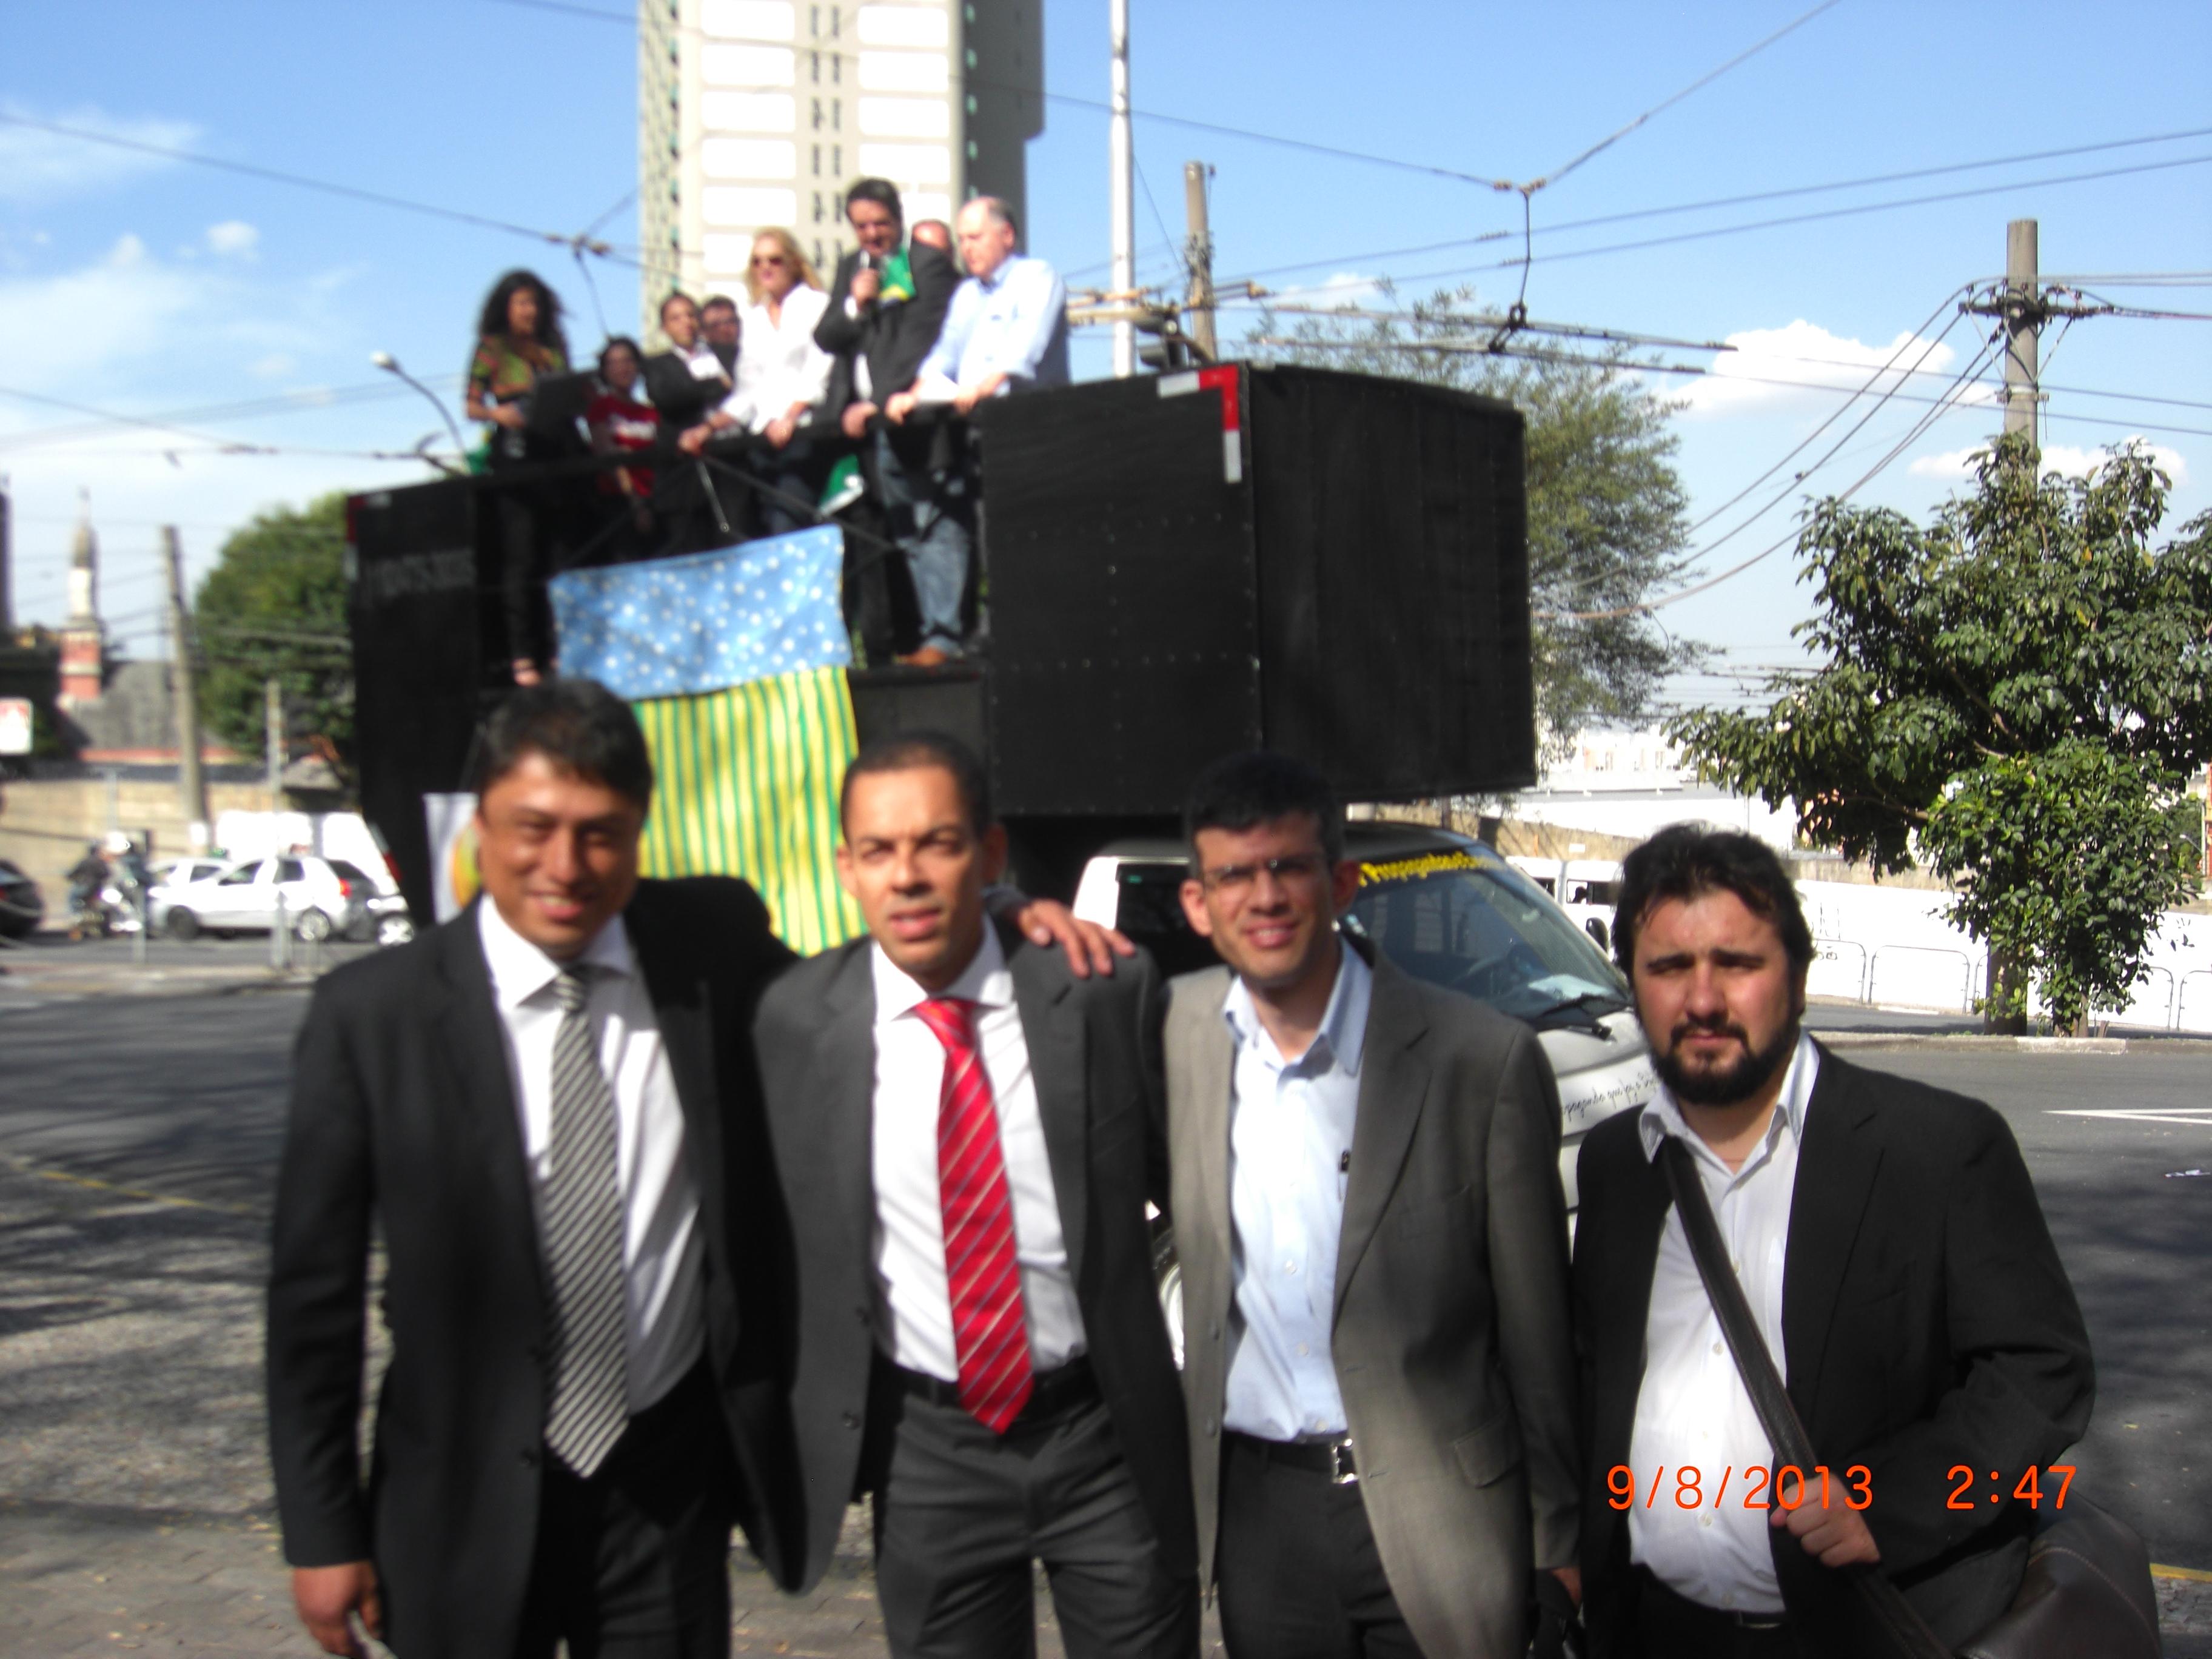 Ato contra o Provimento CGJ 17/2013